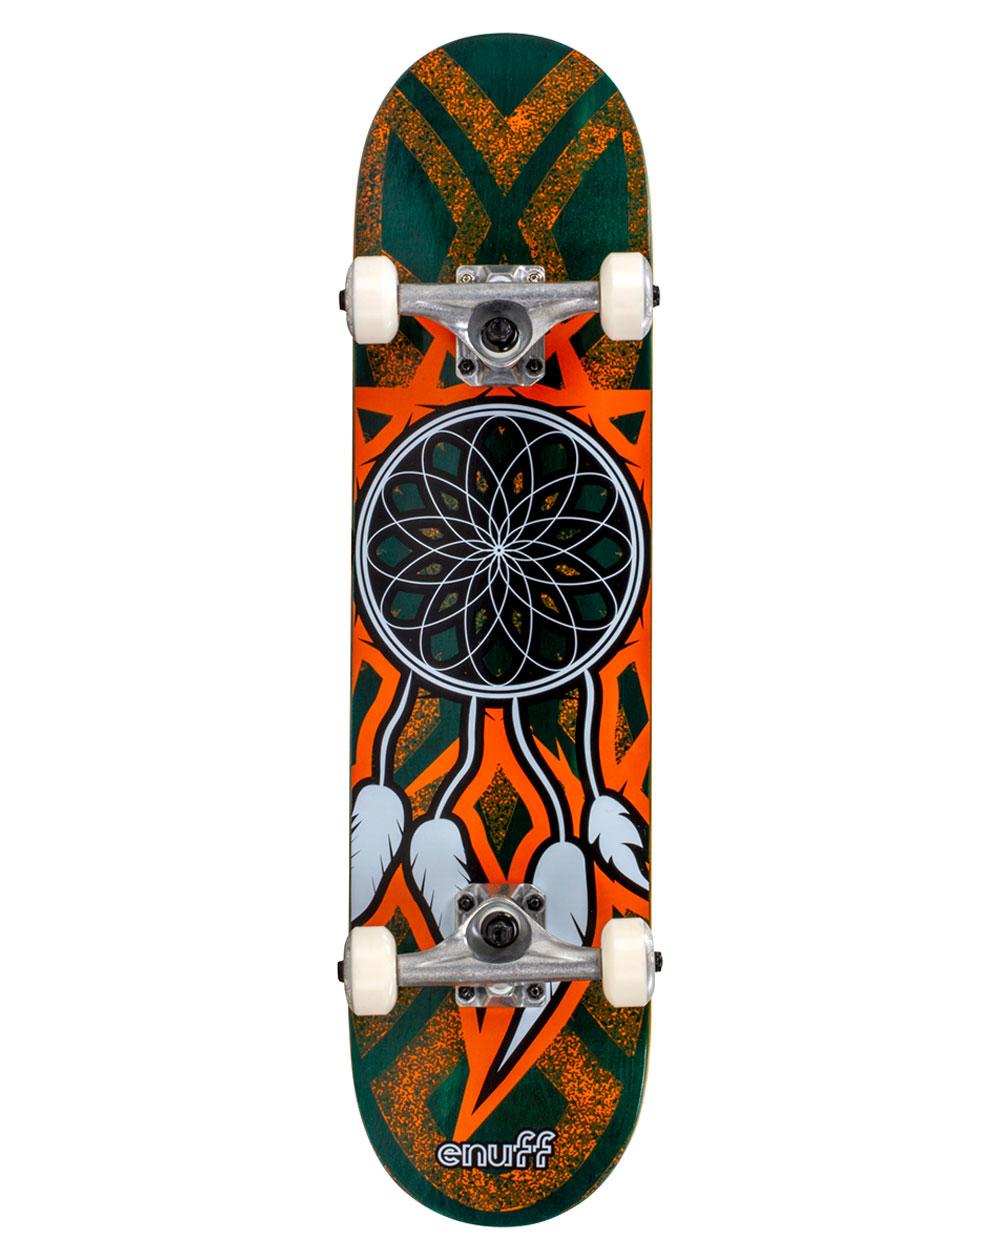 "Enuff Skate Montado Dreamcatcher 7.75"" Teal/Orange"